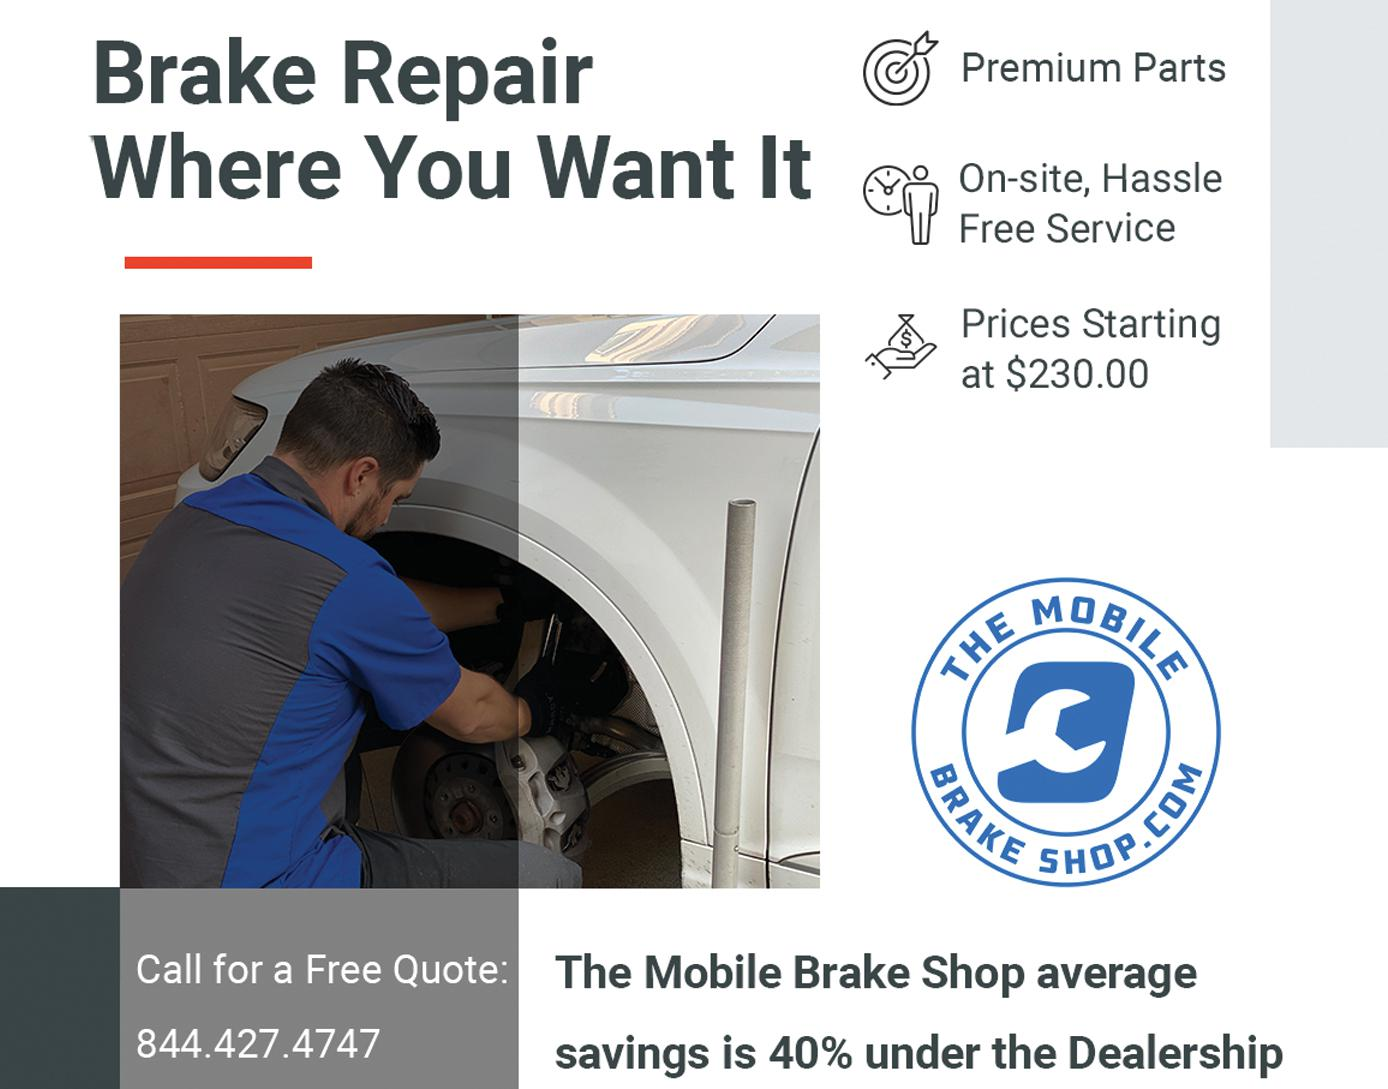 The Mobile Brake Shop